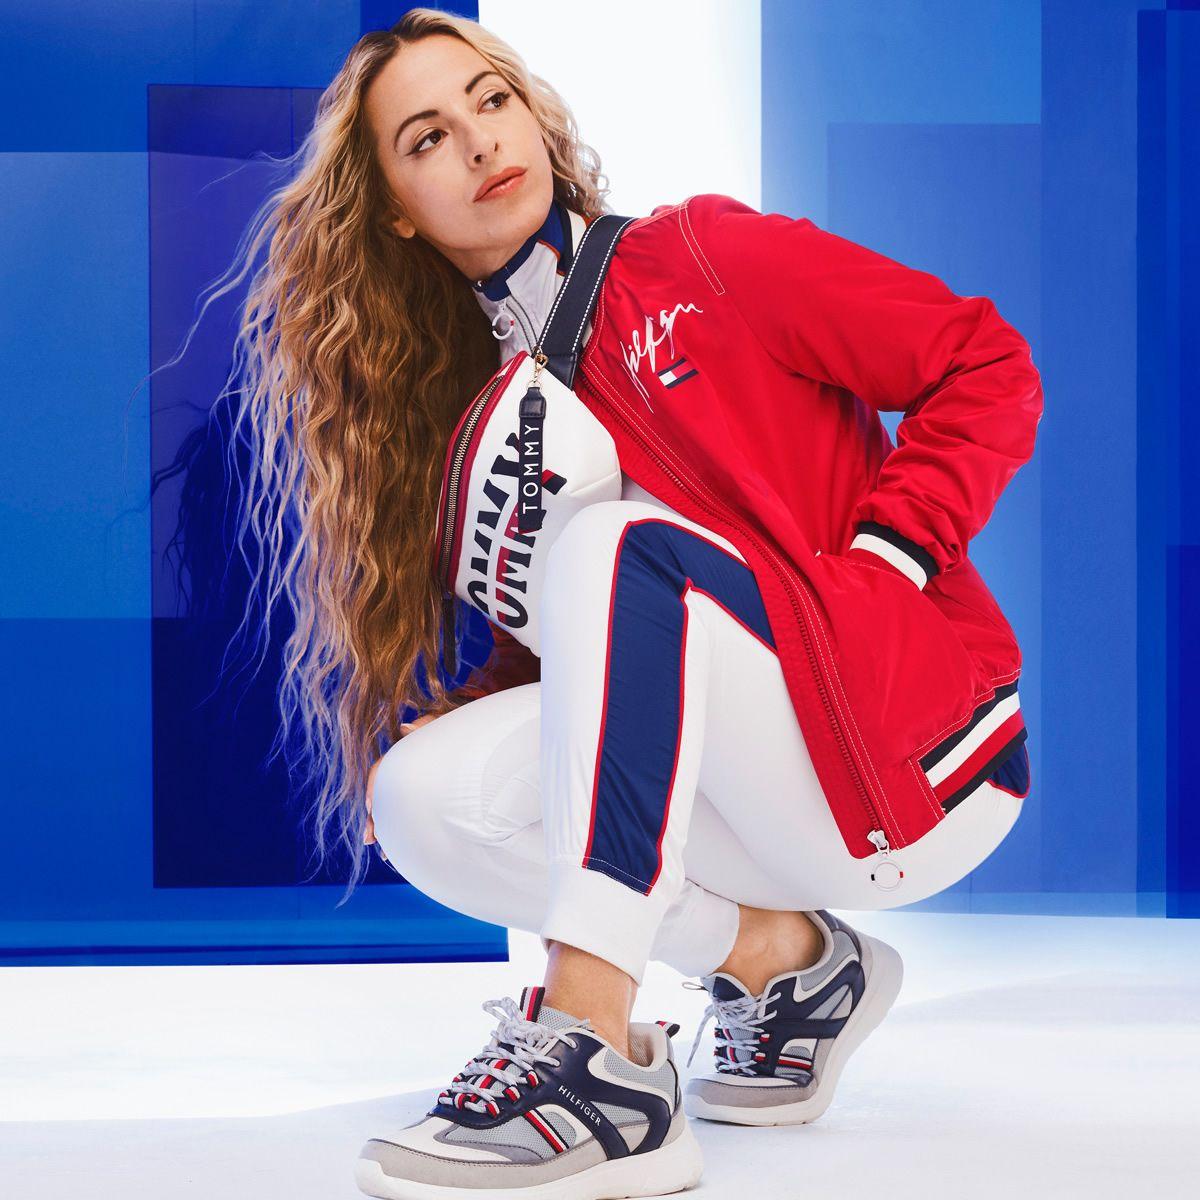 32c1360ed6f Tommy Hilfiger Clothes - Dresses   Jeans - Macy s